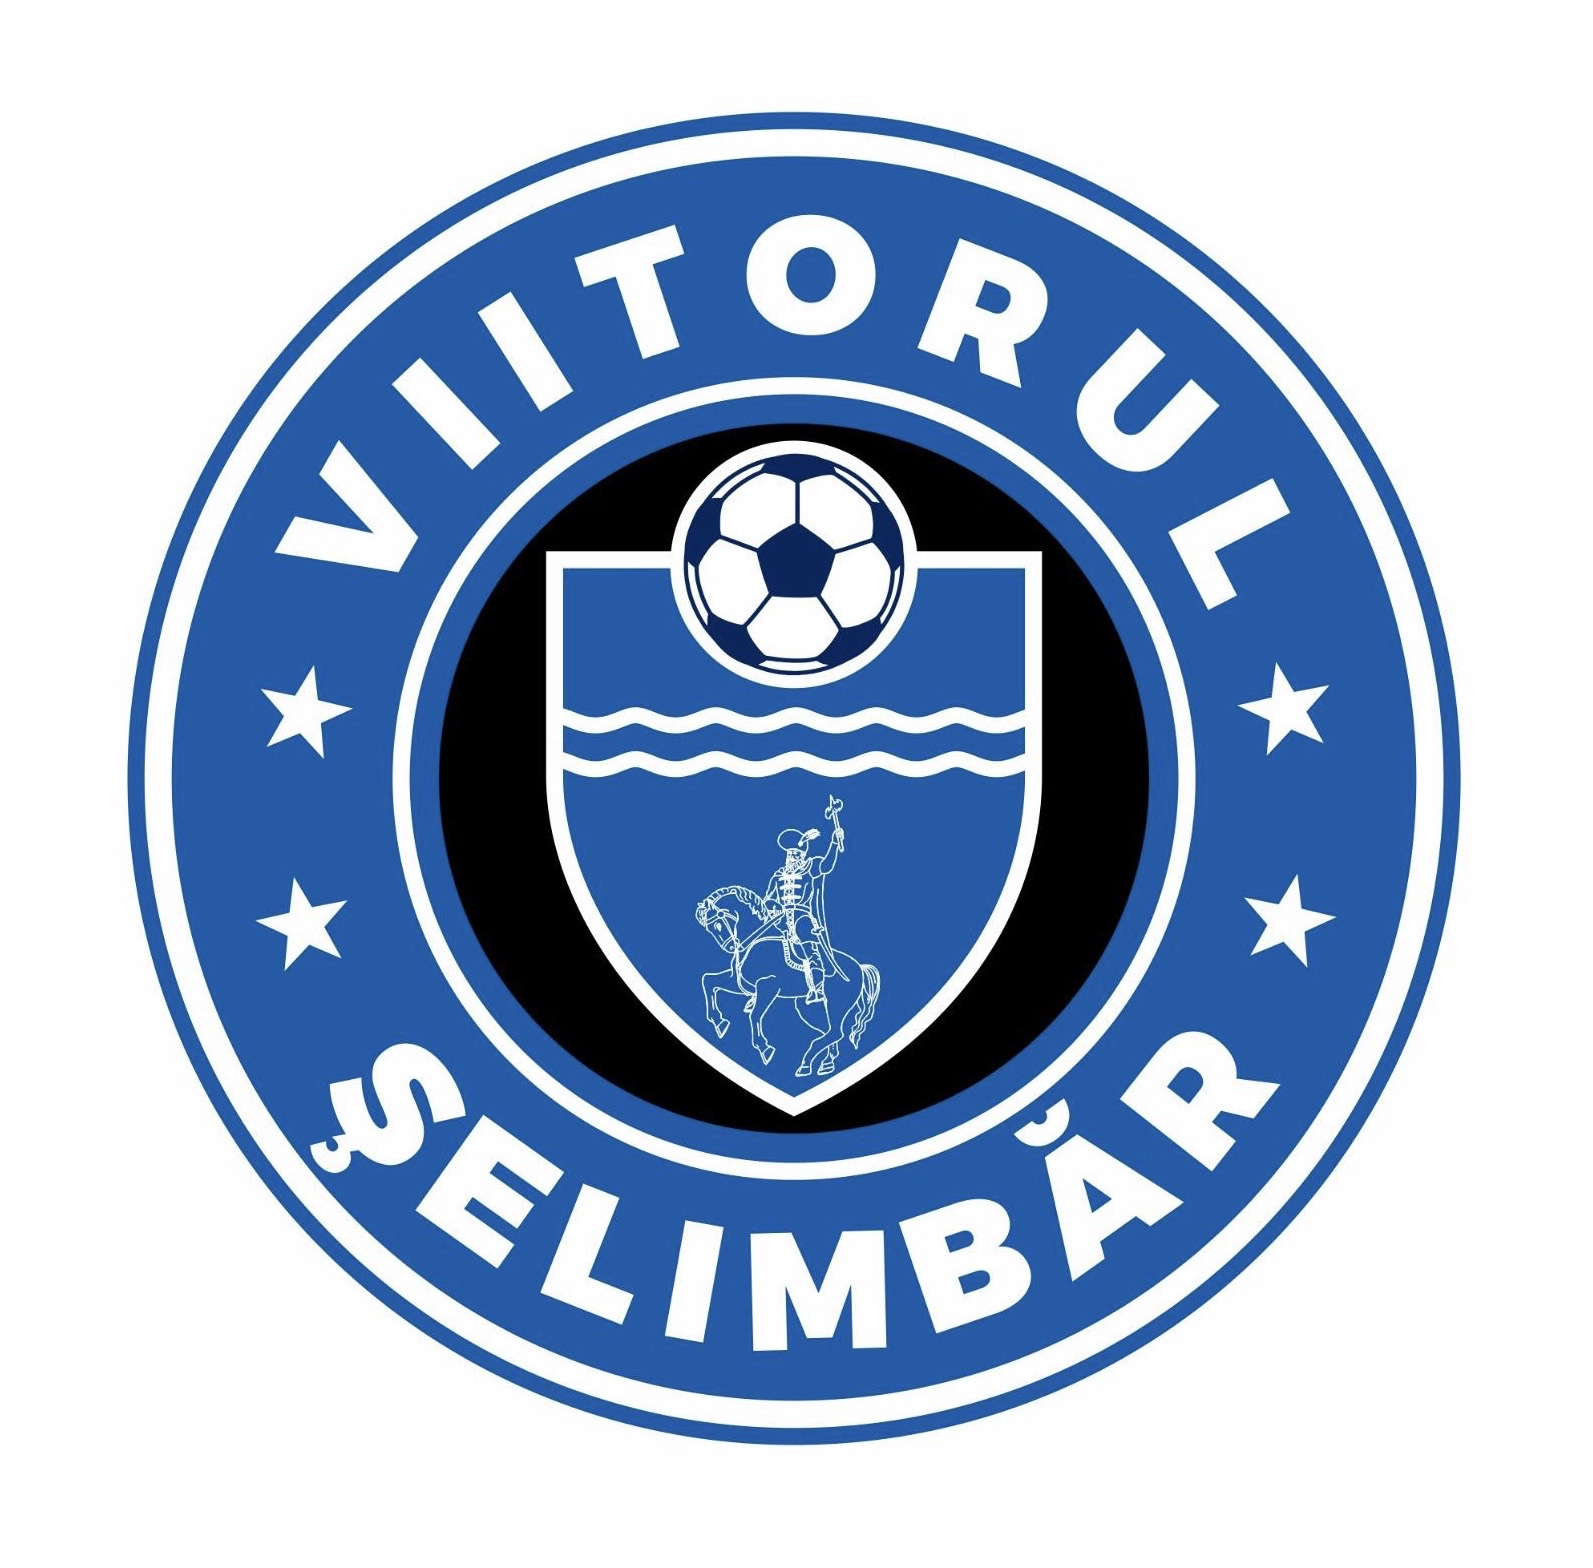 ACS Viitorul Selimbar